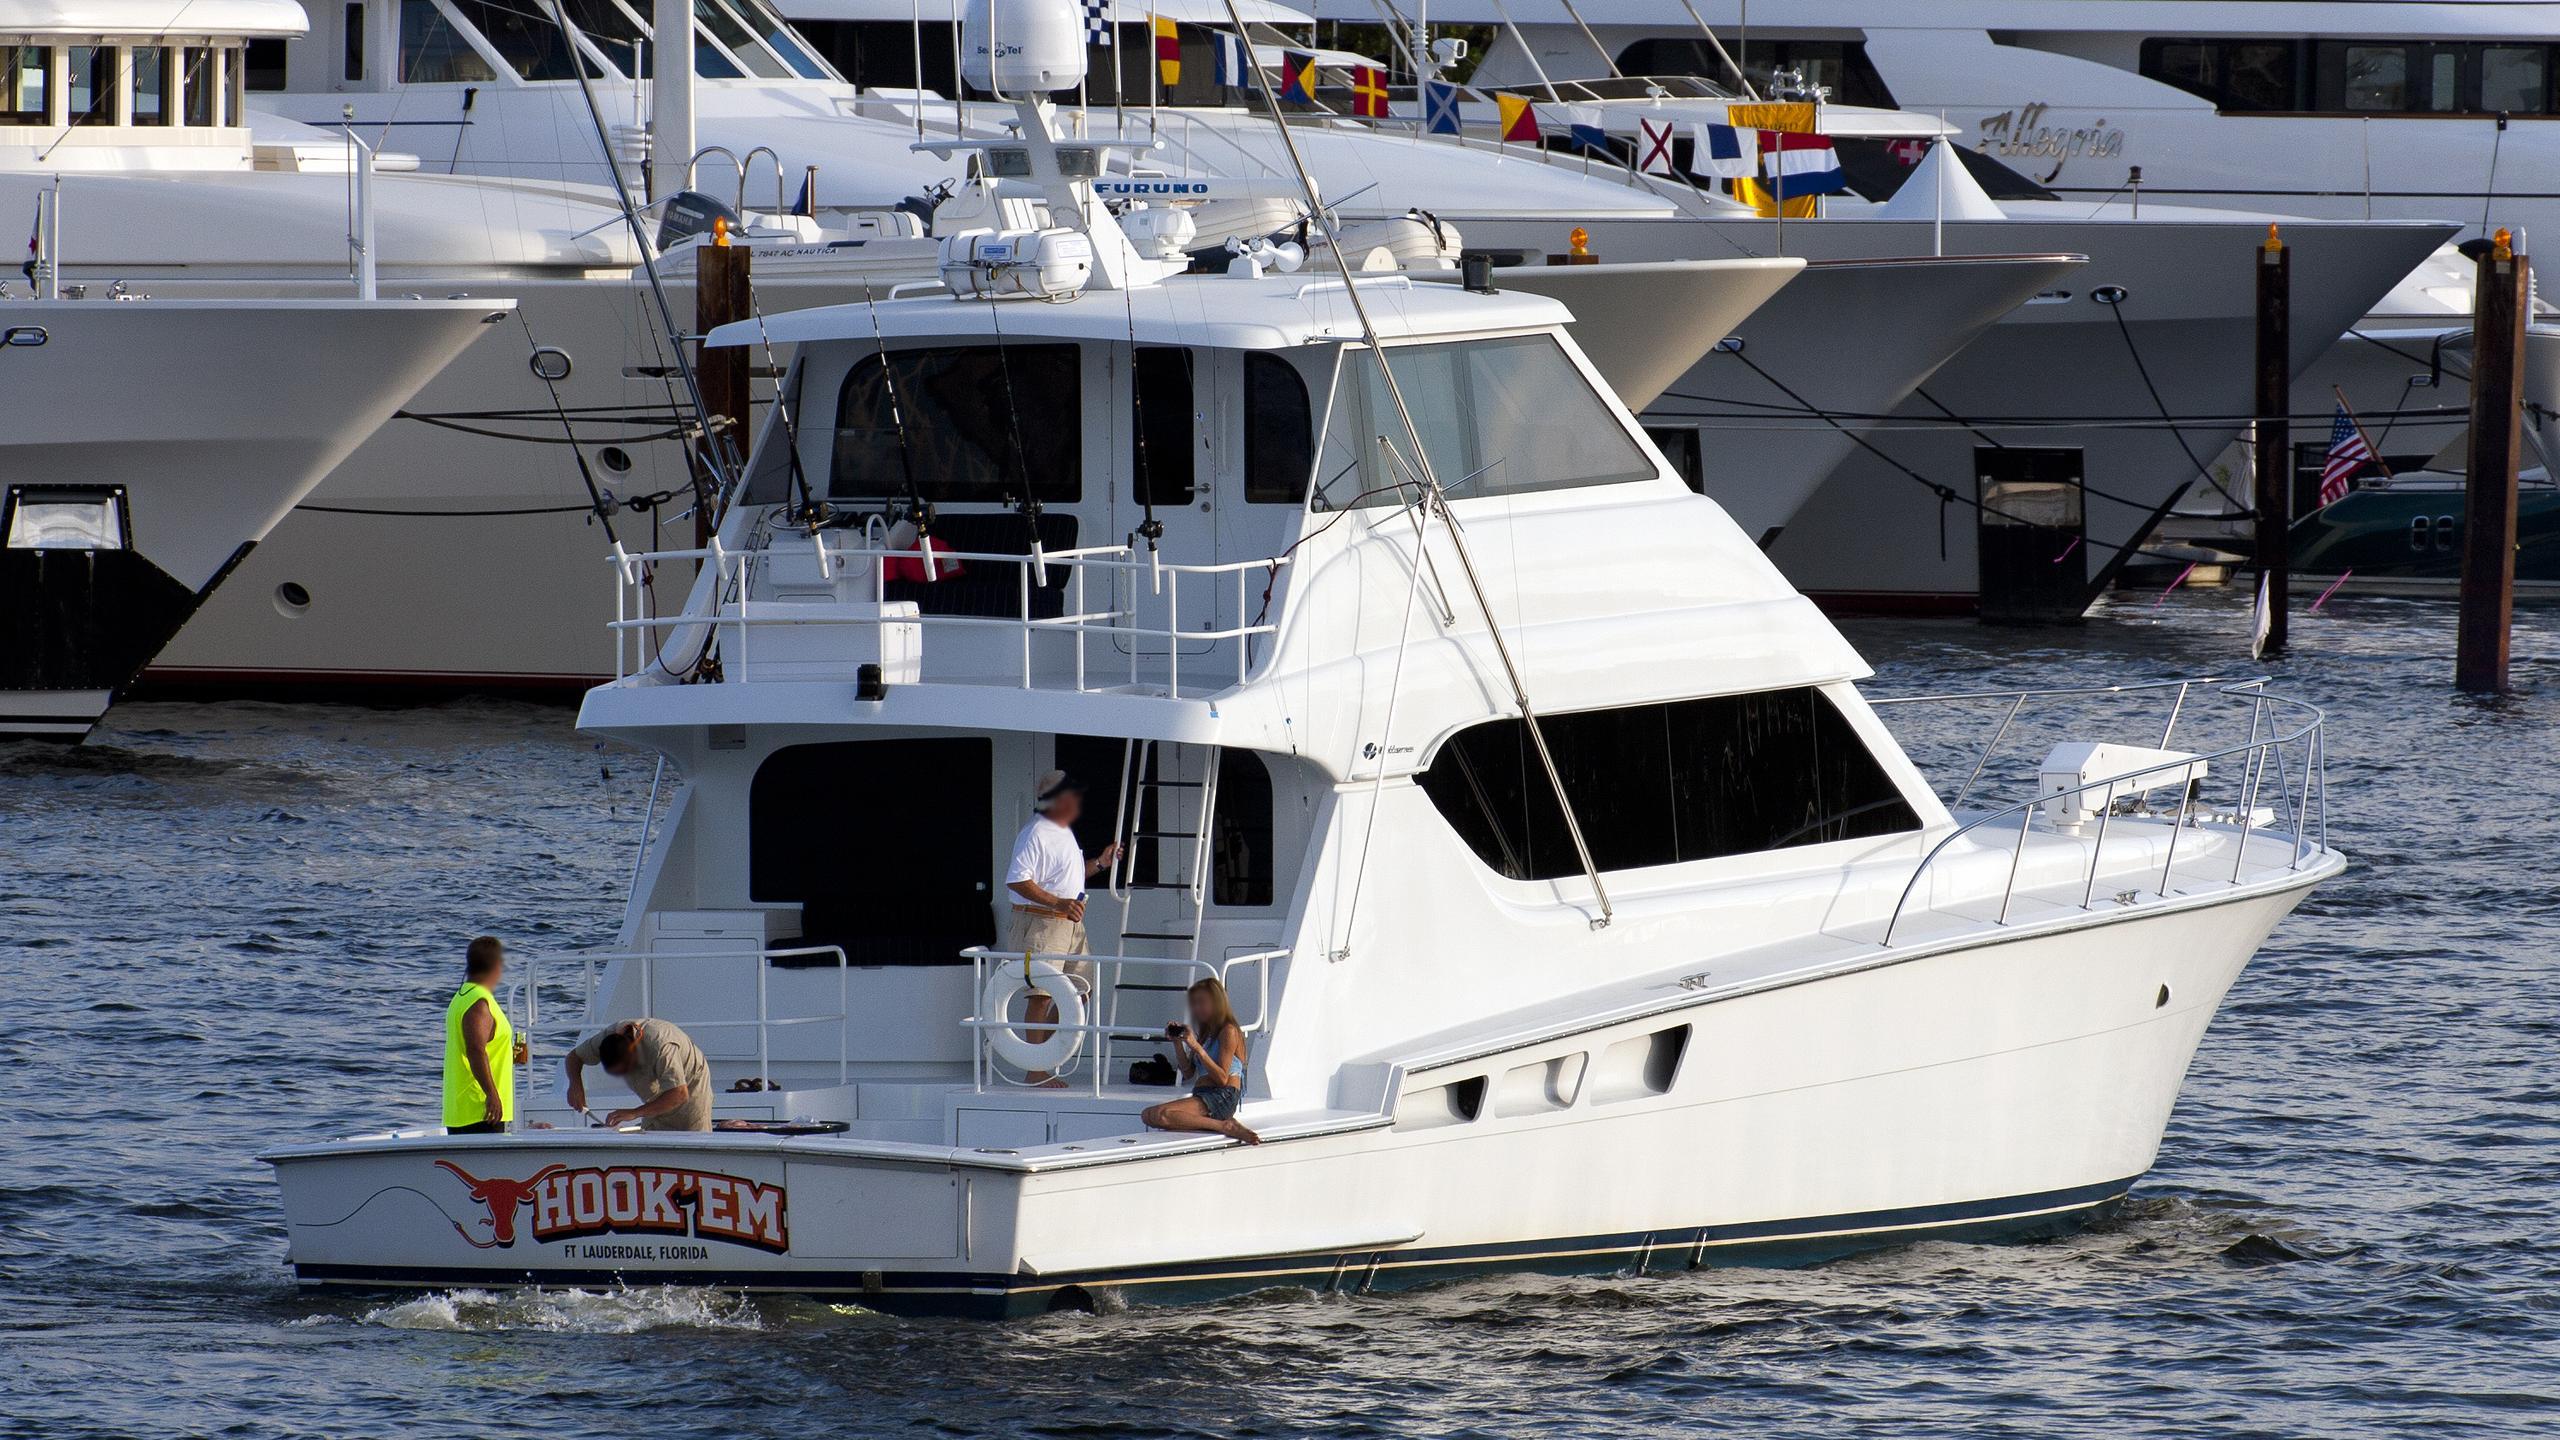 hook-em-yacht-exterior